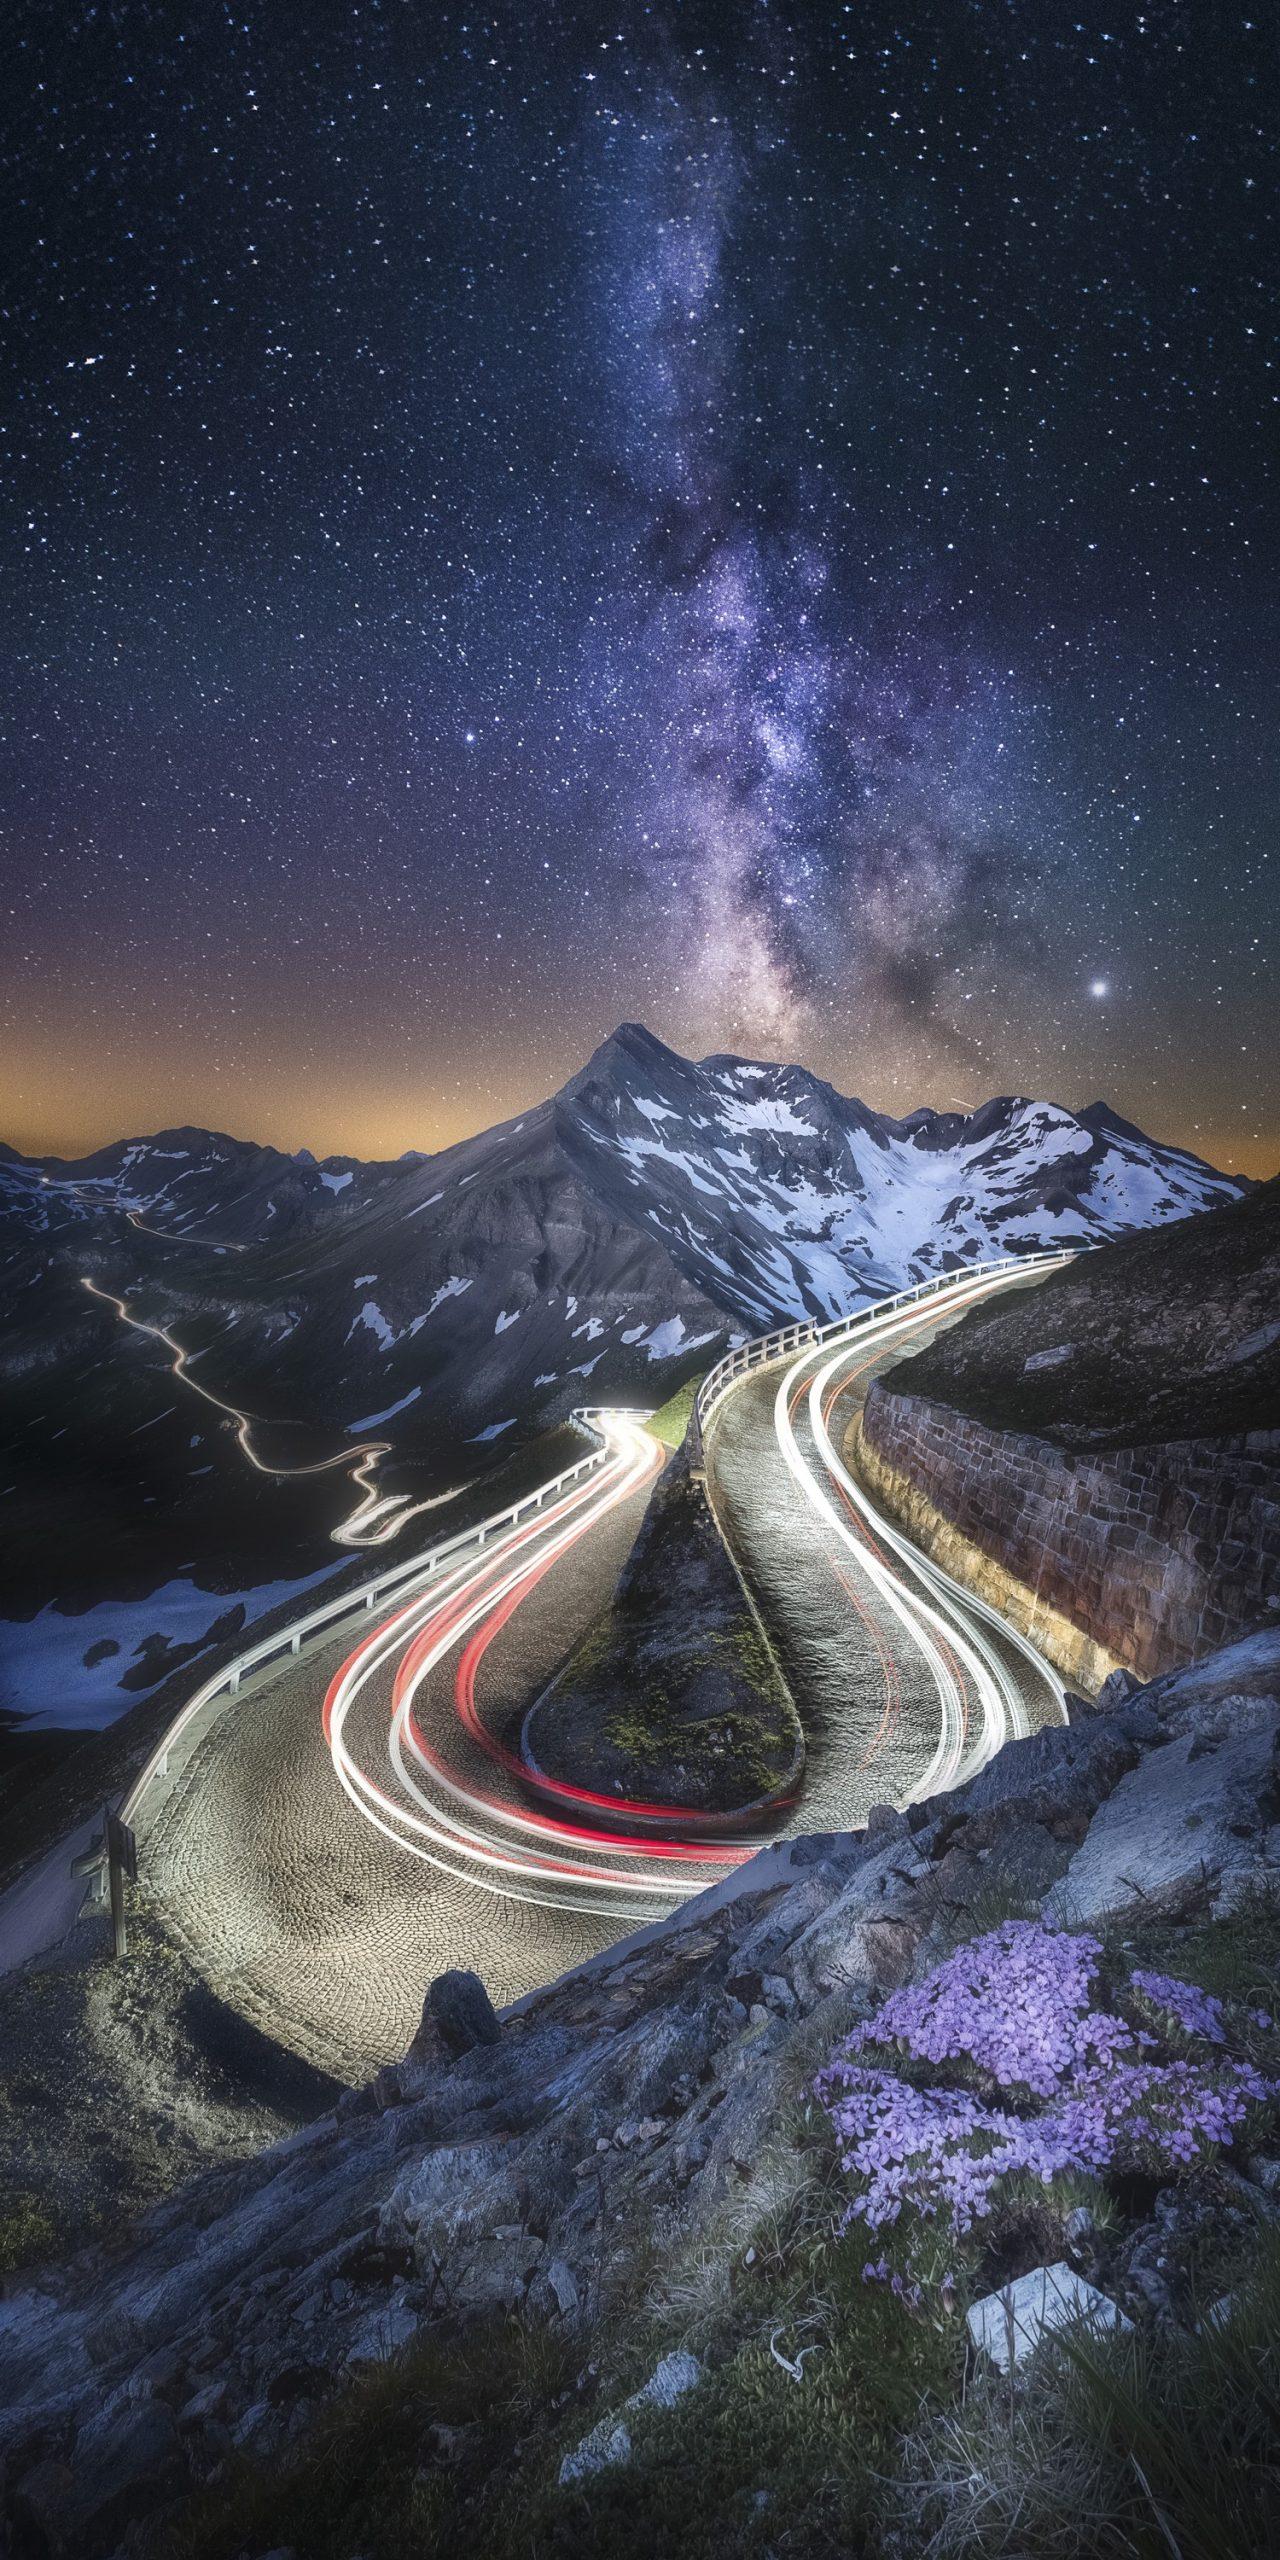 'Milky Way', Grossglockner High Alpine Road, Austria – Daniel Trippolt